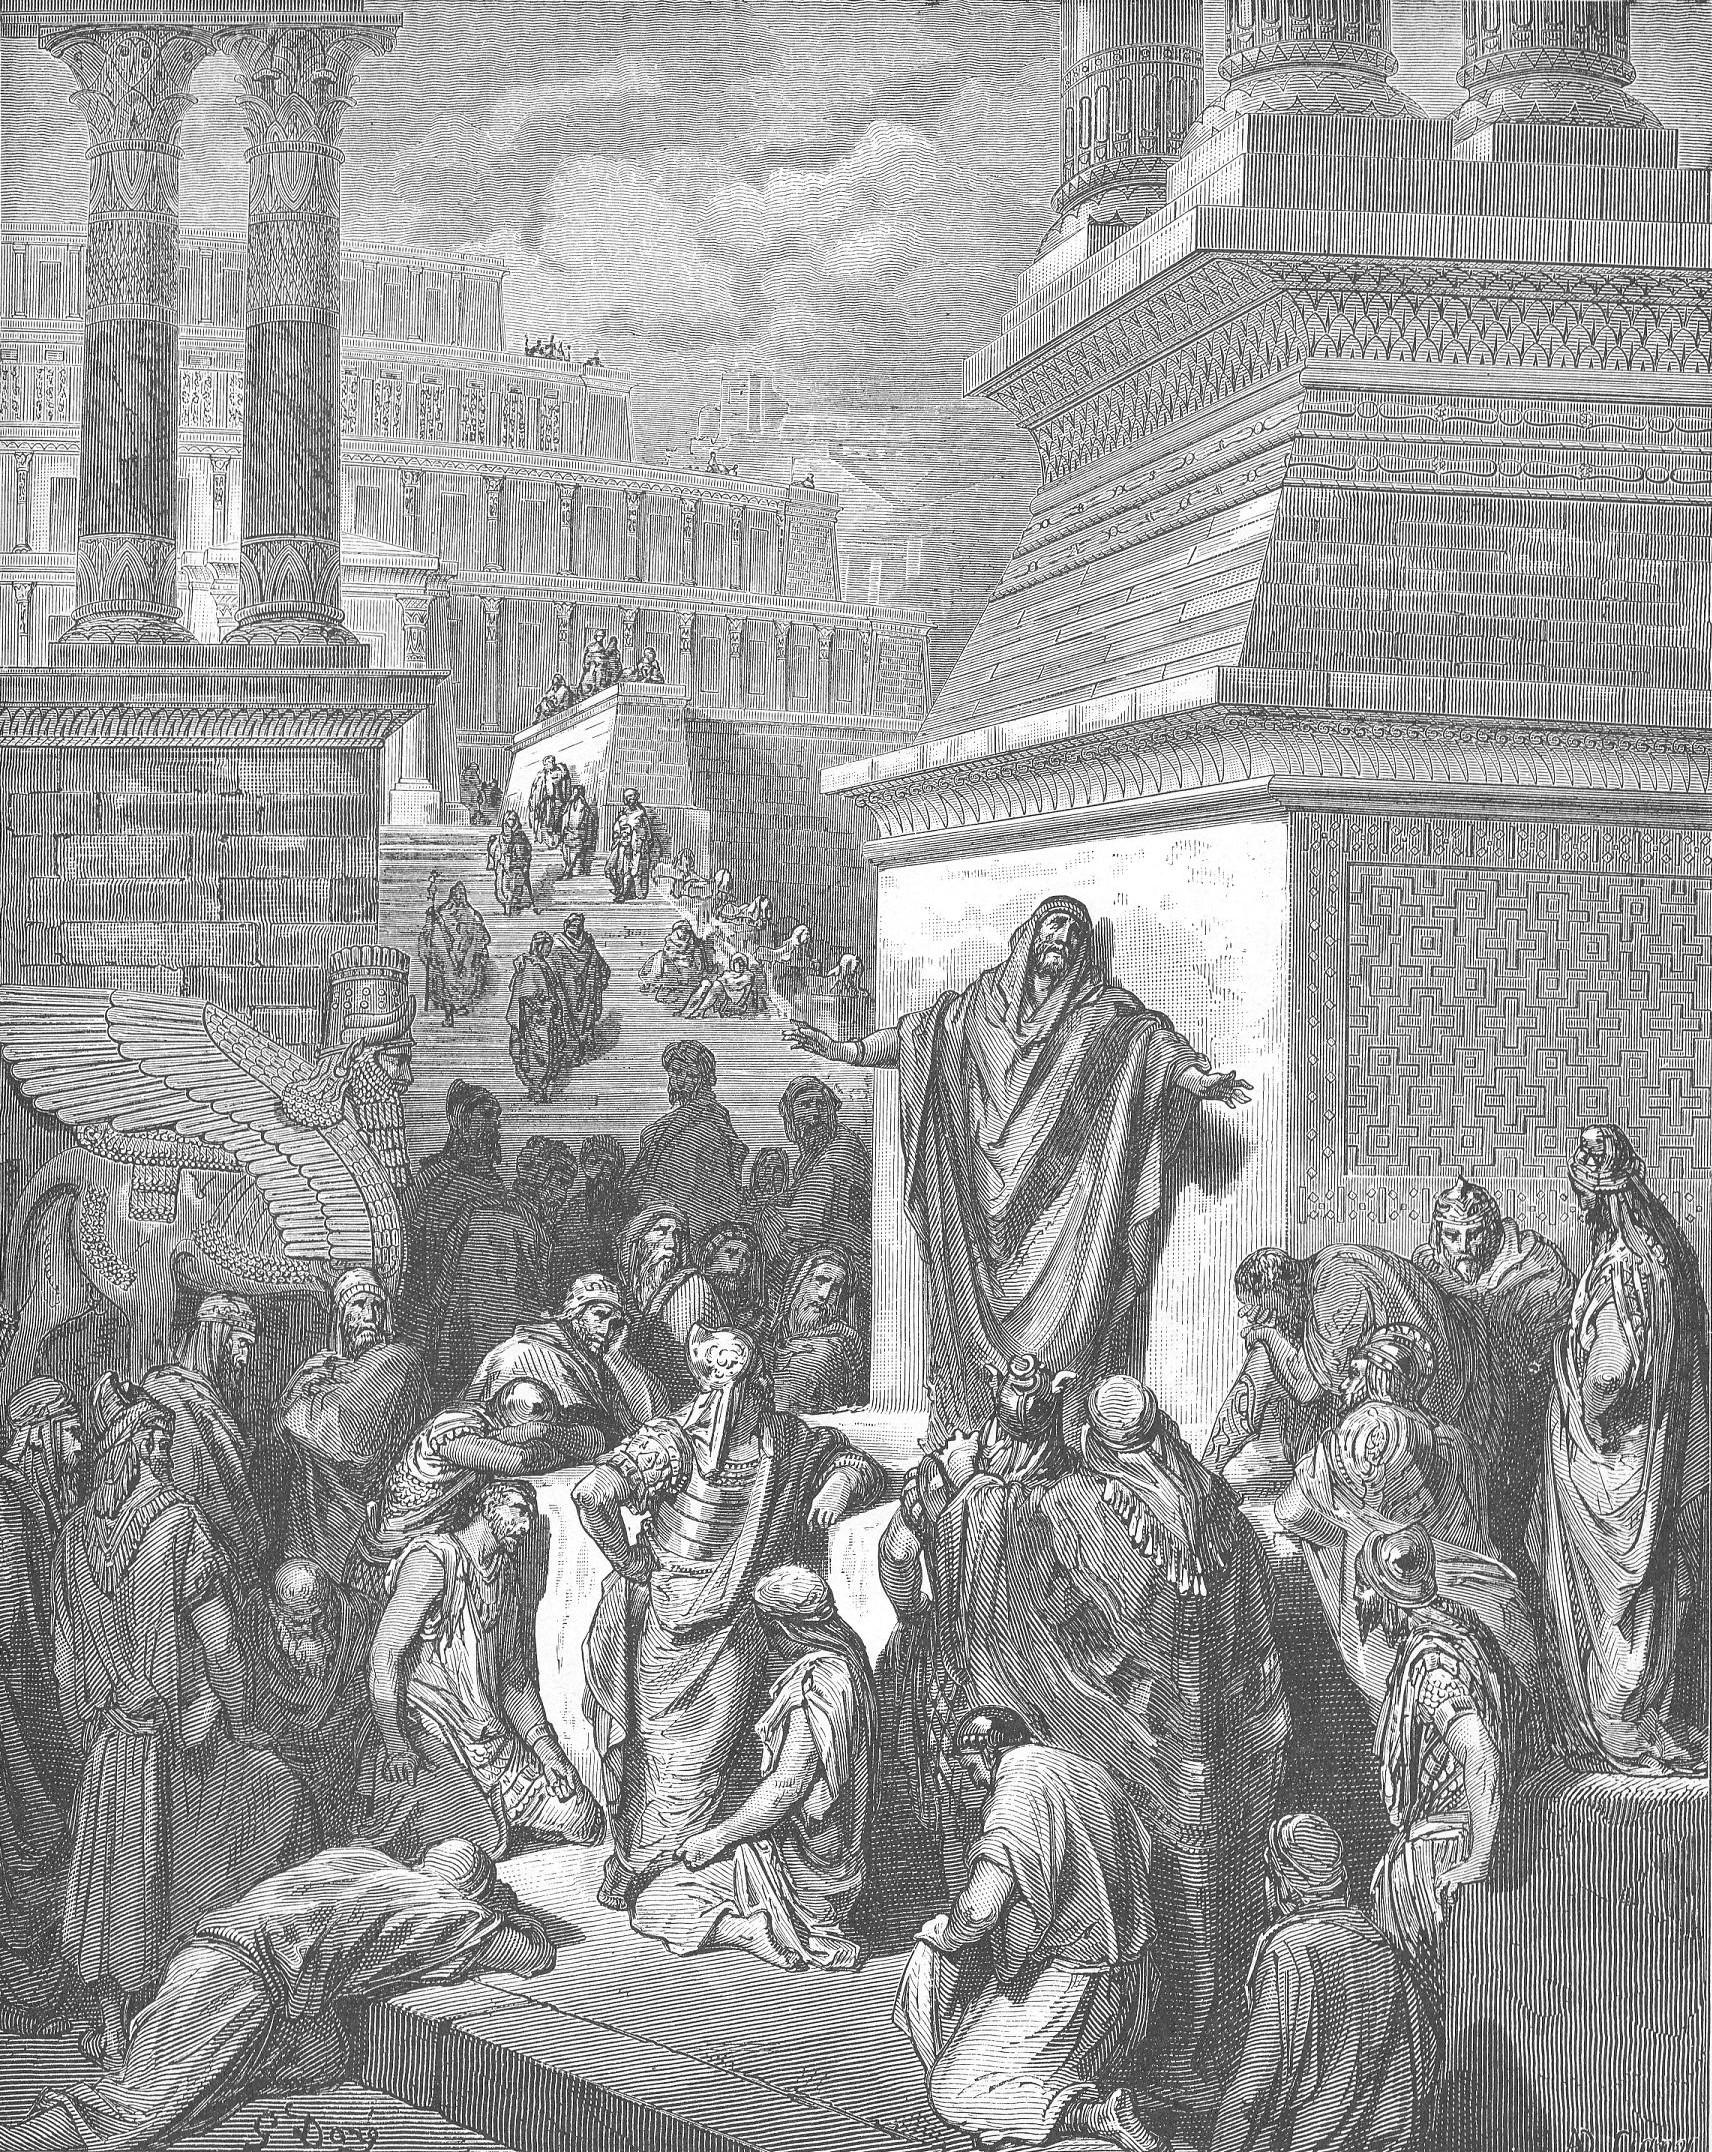 Gustave Doré, Jonah preaching to the Ninevites